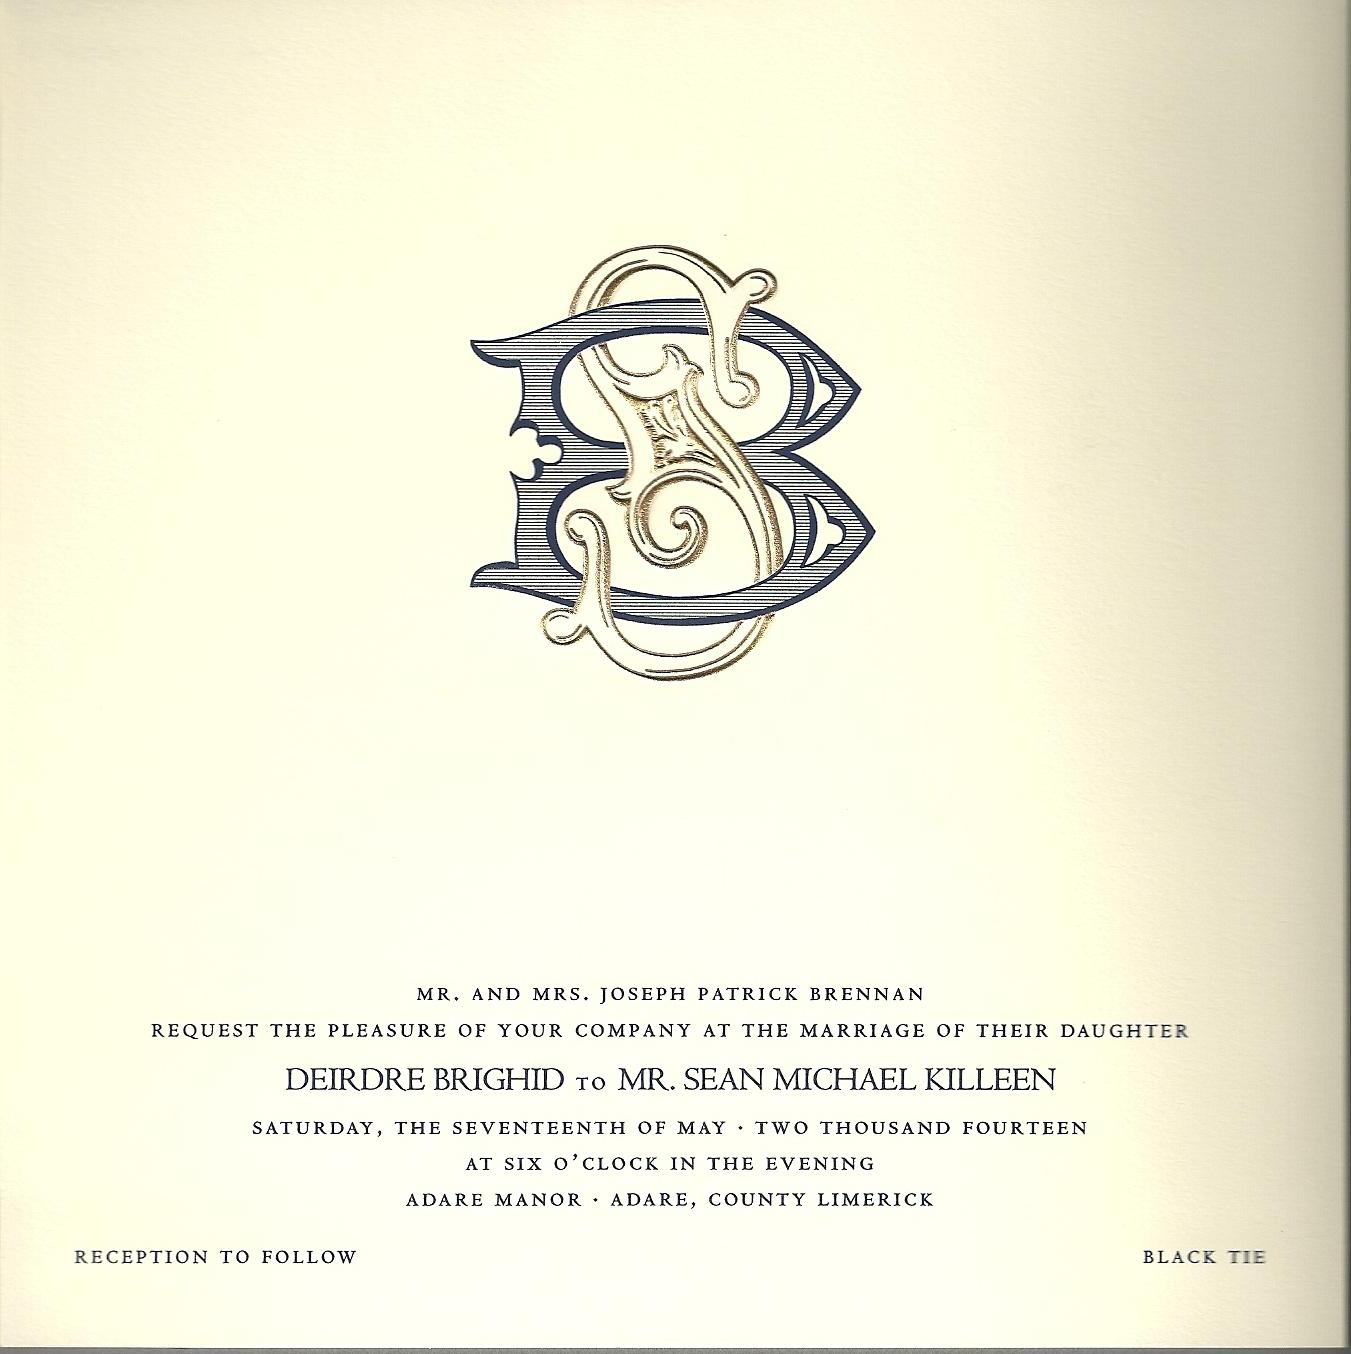 Hayden Avery Fine Stationery: New Crane & Co. Wedding Album